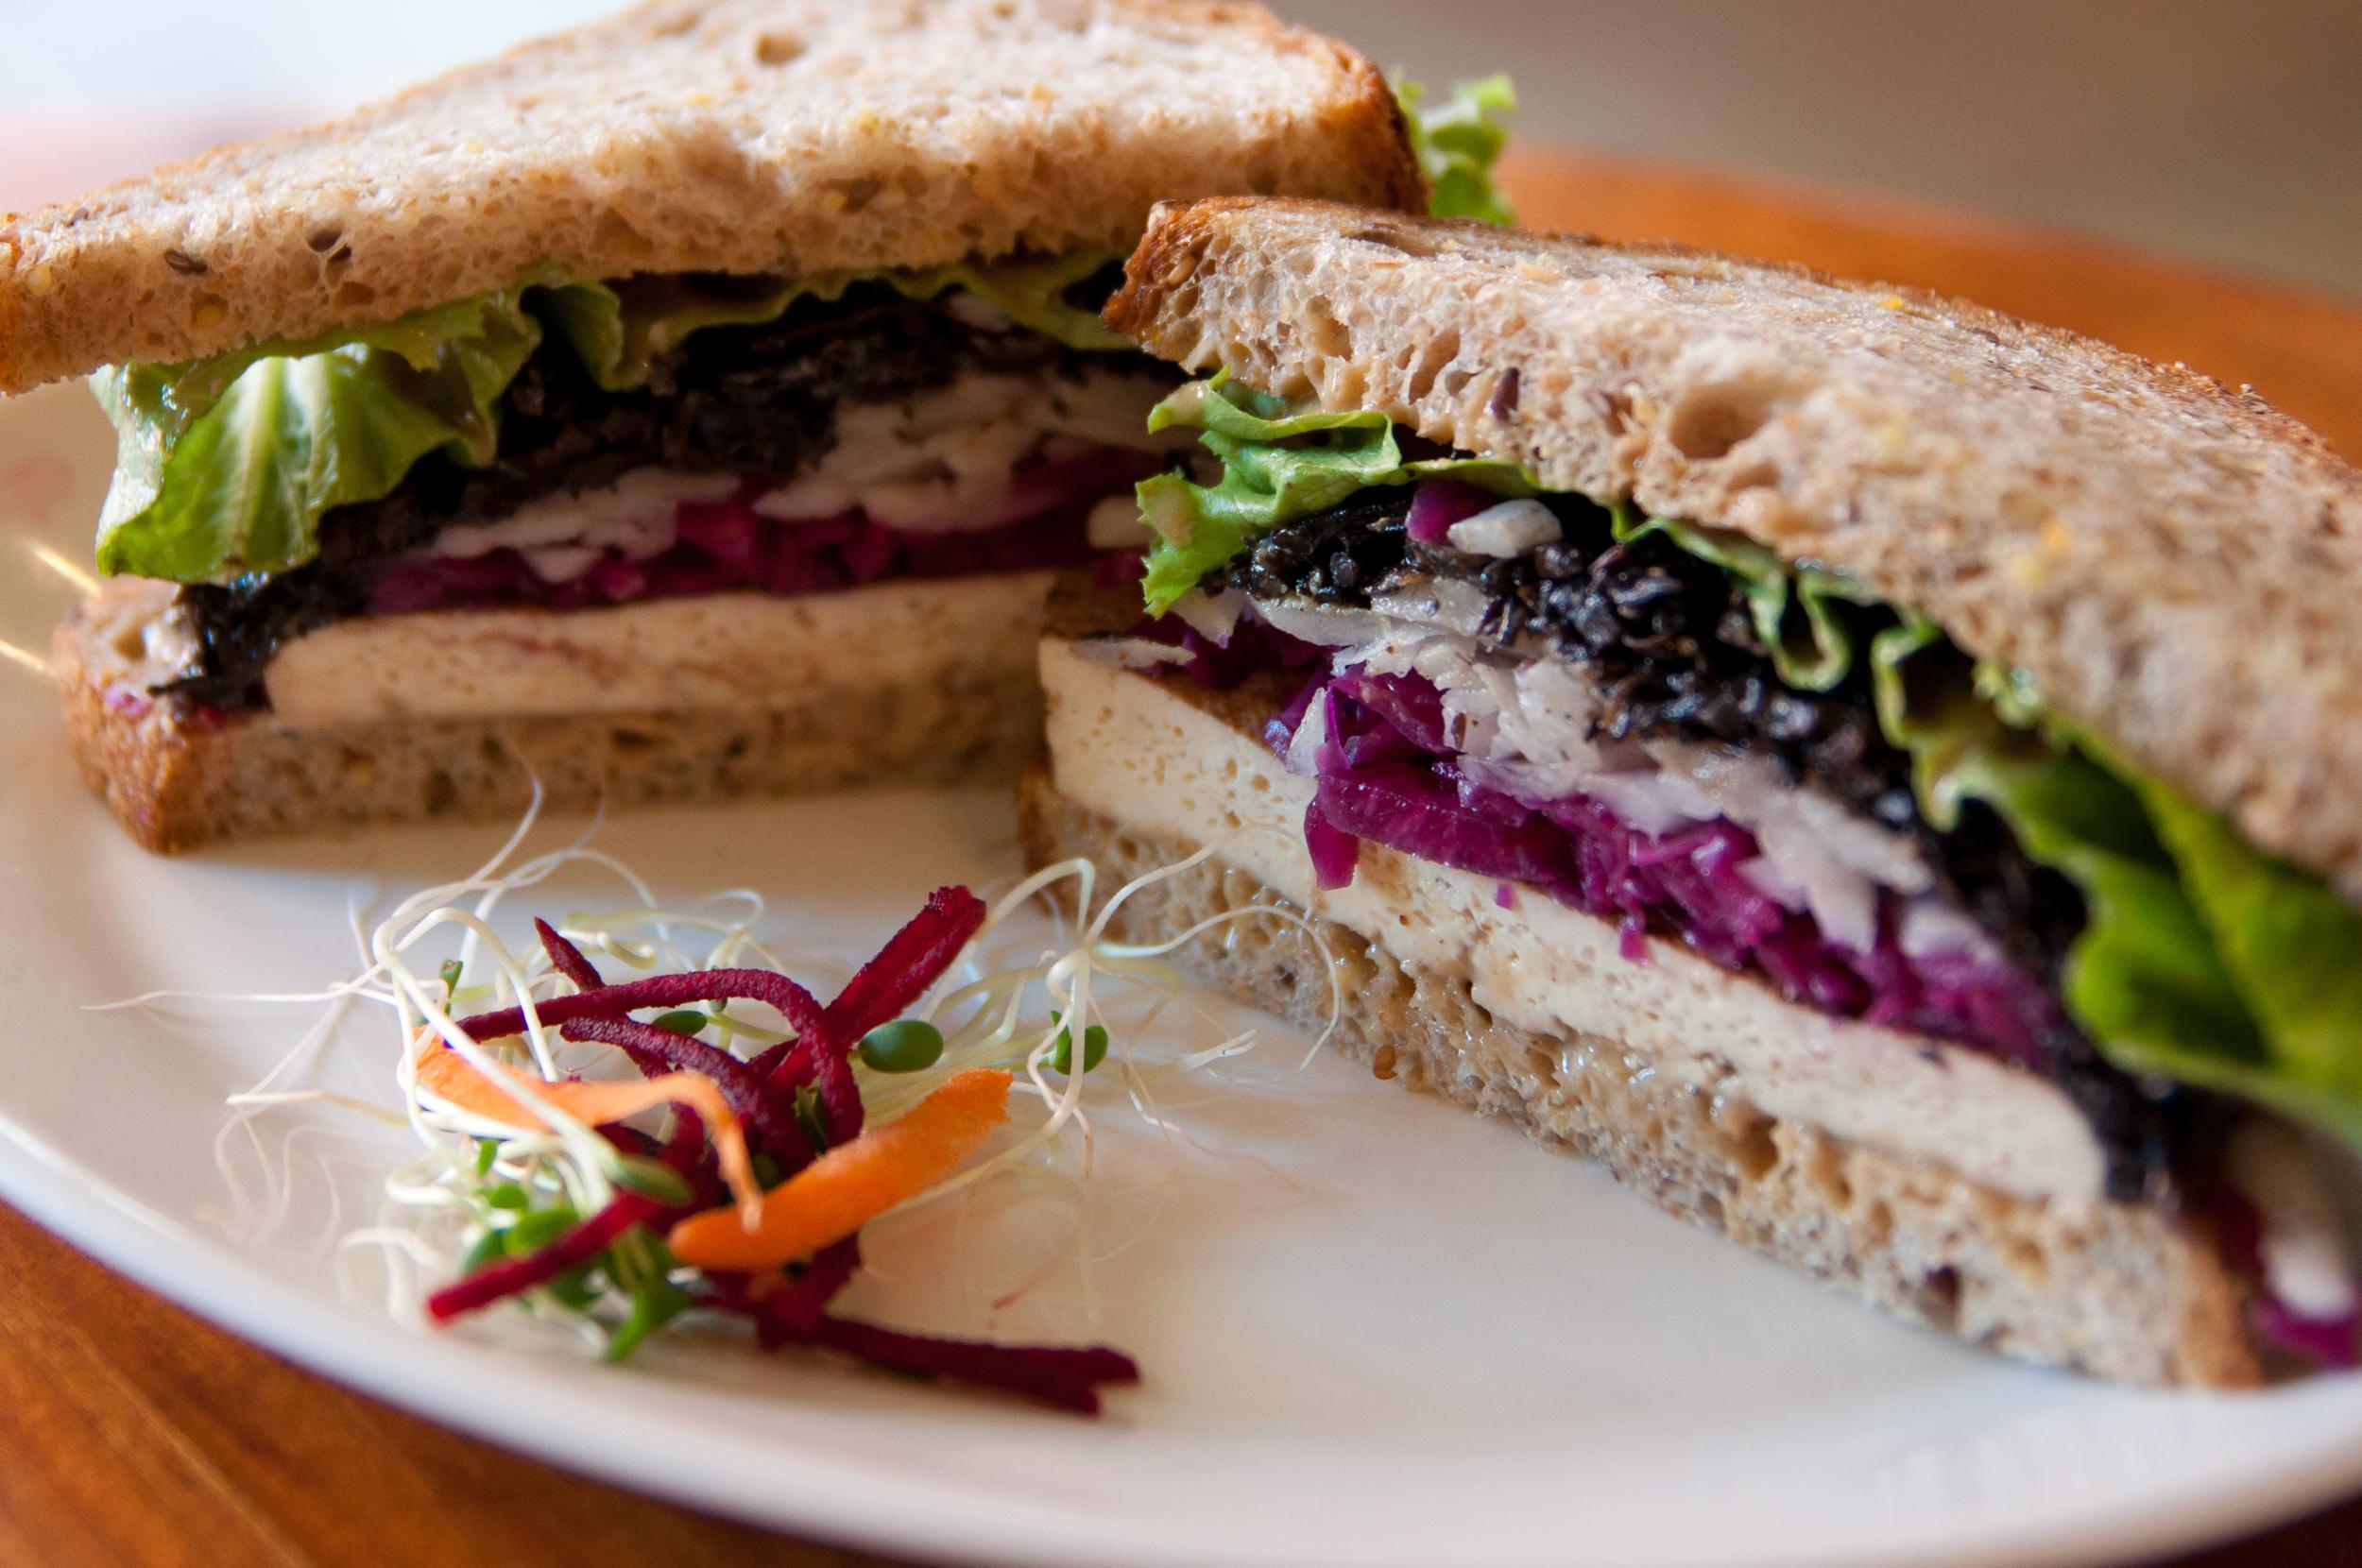 editorial-commercial-photography-long-island-ny-nyc-restaurant-food-photography-tofu-sandwich-digital.jpg